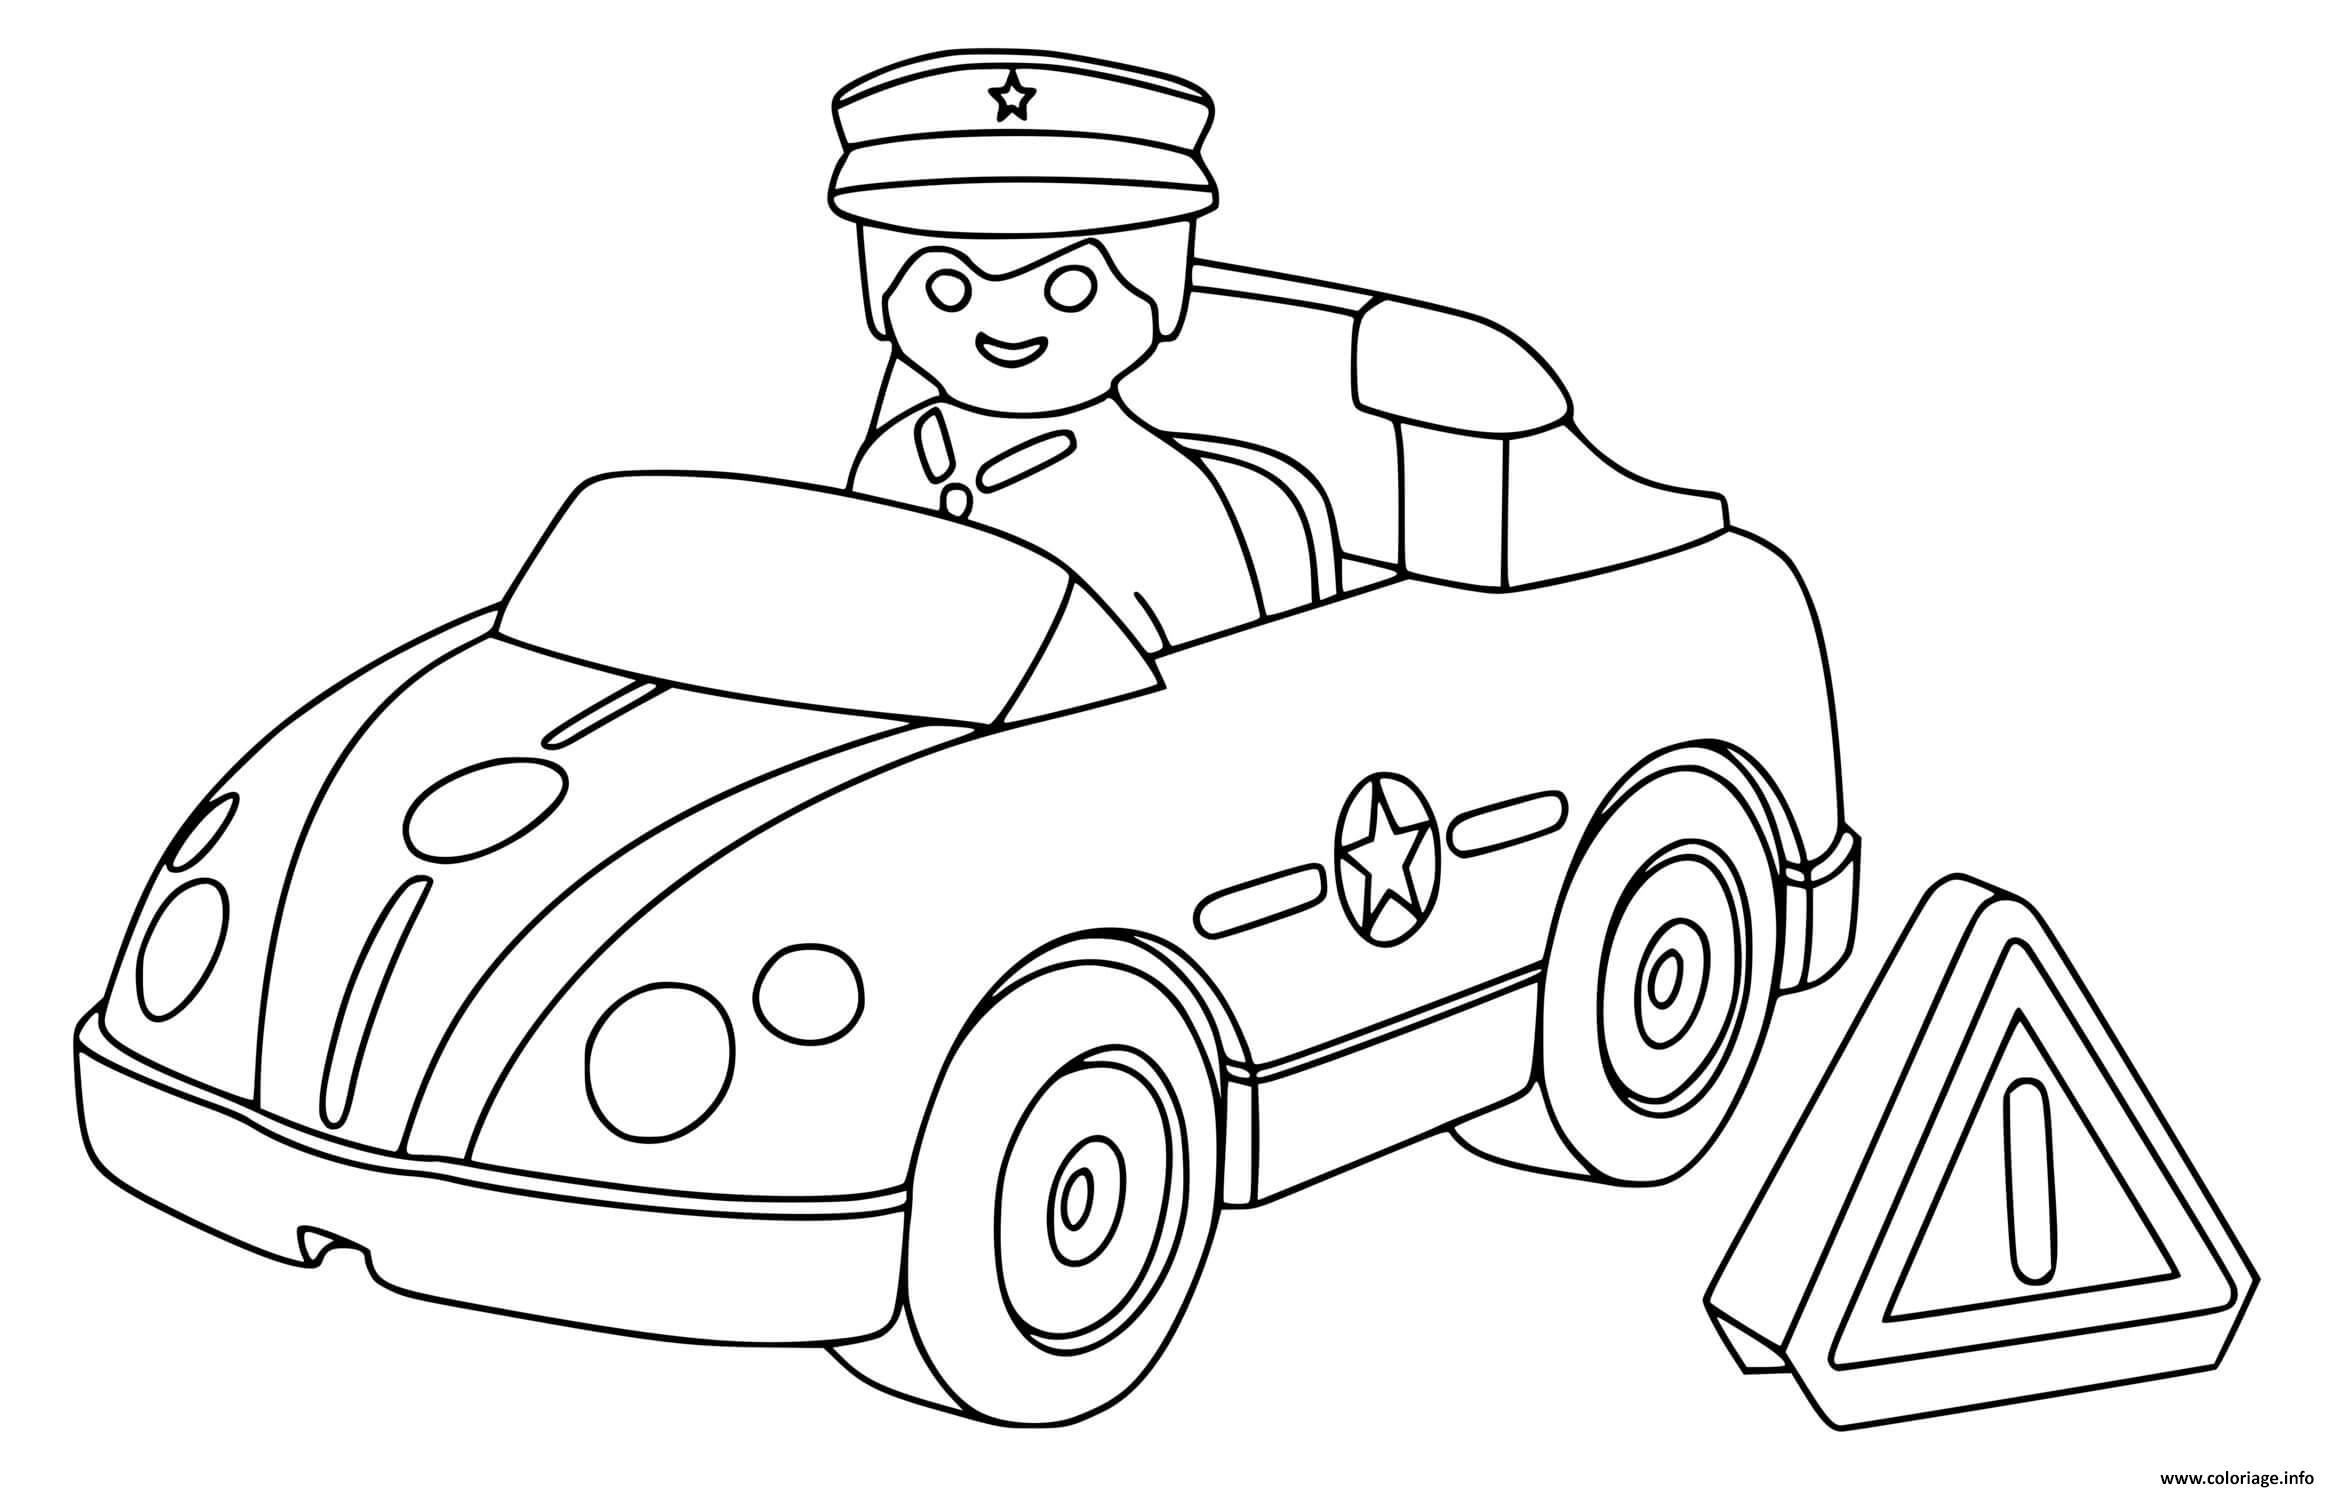 Coloriage Voiture De Police Playmobil Dessin Voiture De intérieur Dessin Voiture De Police A Imprimer